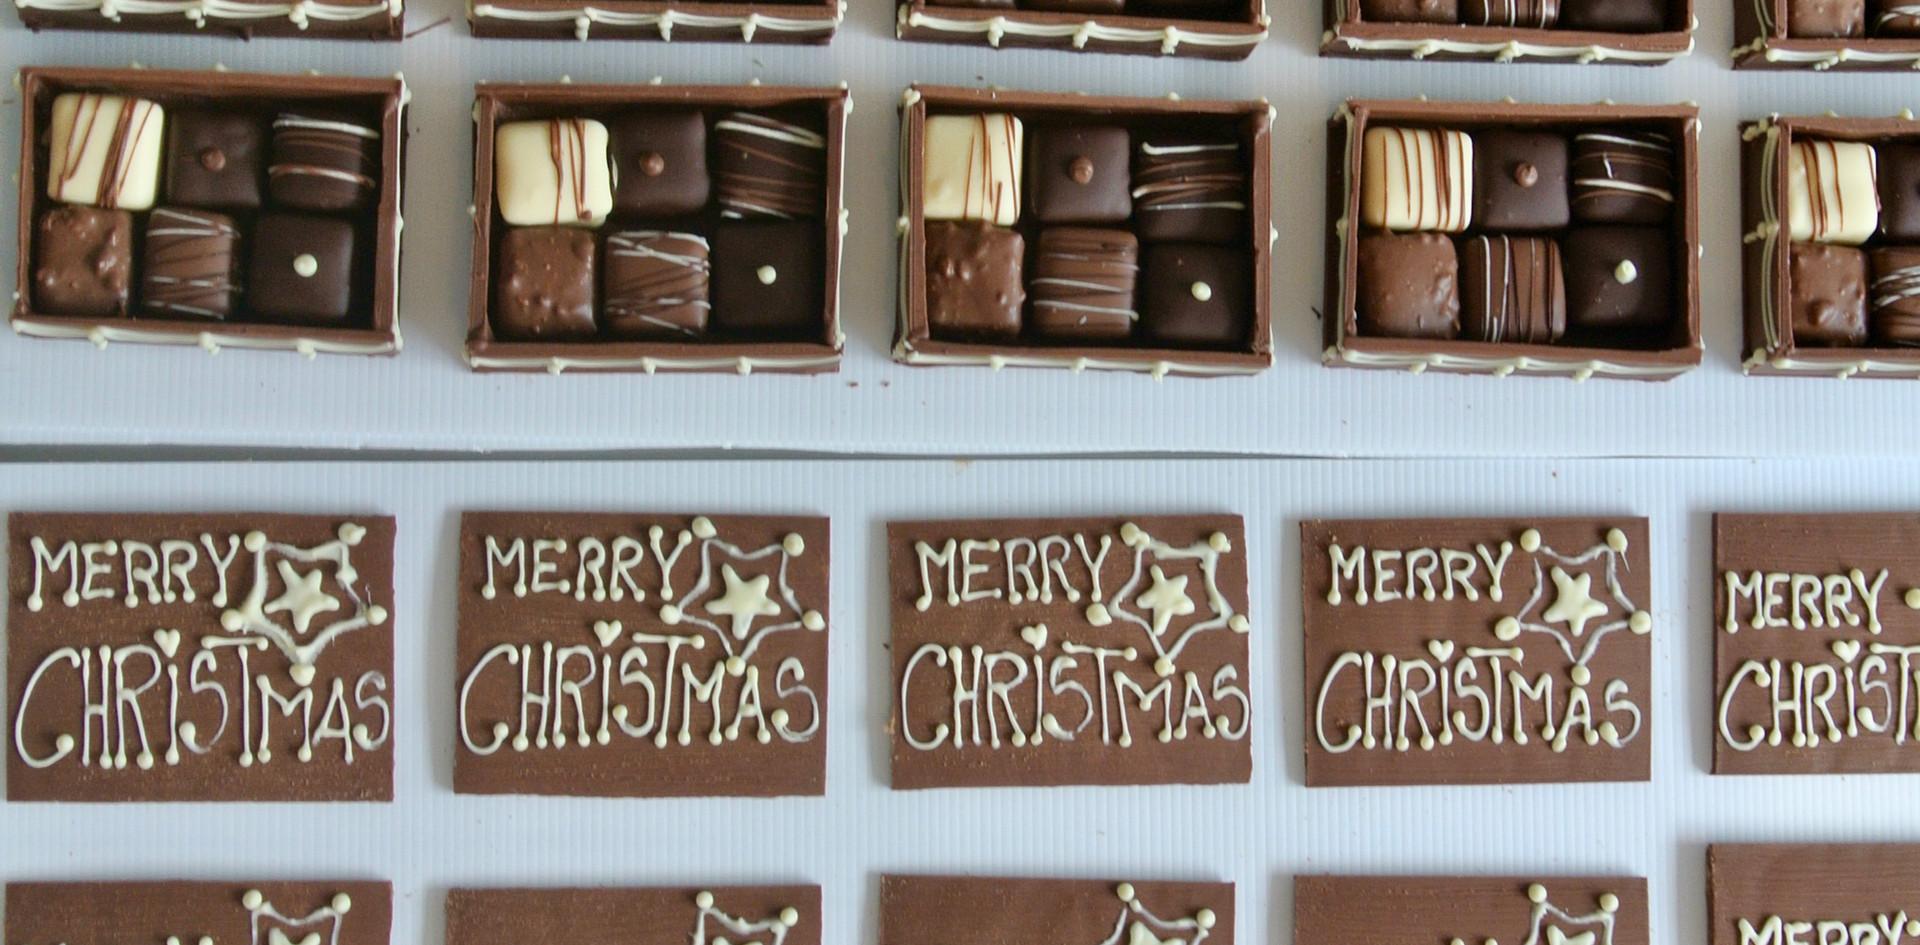 chocolate boxe